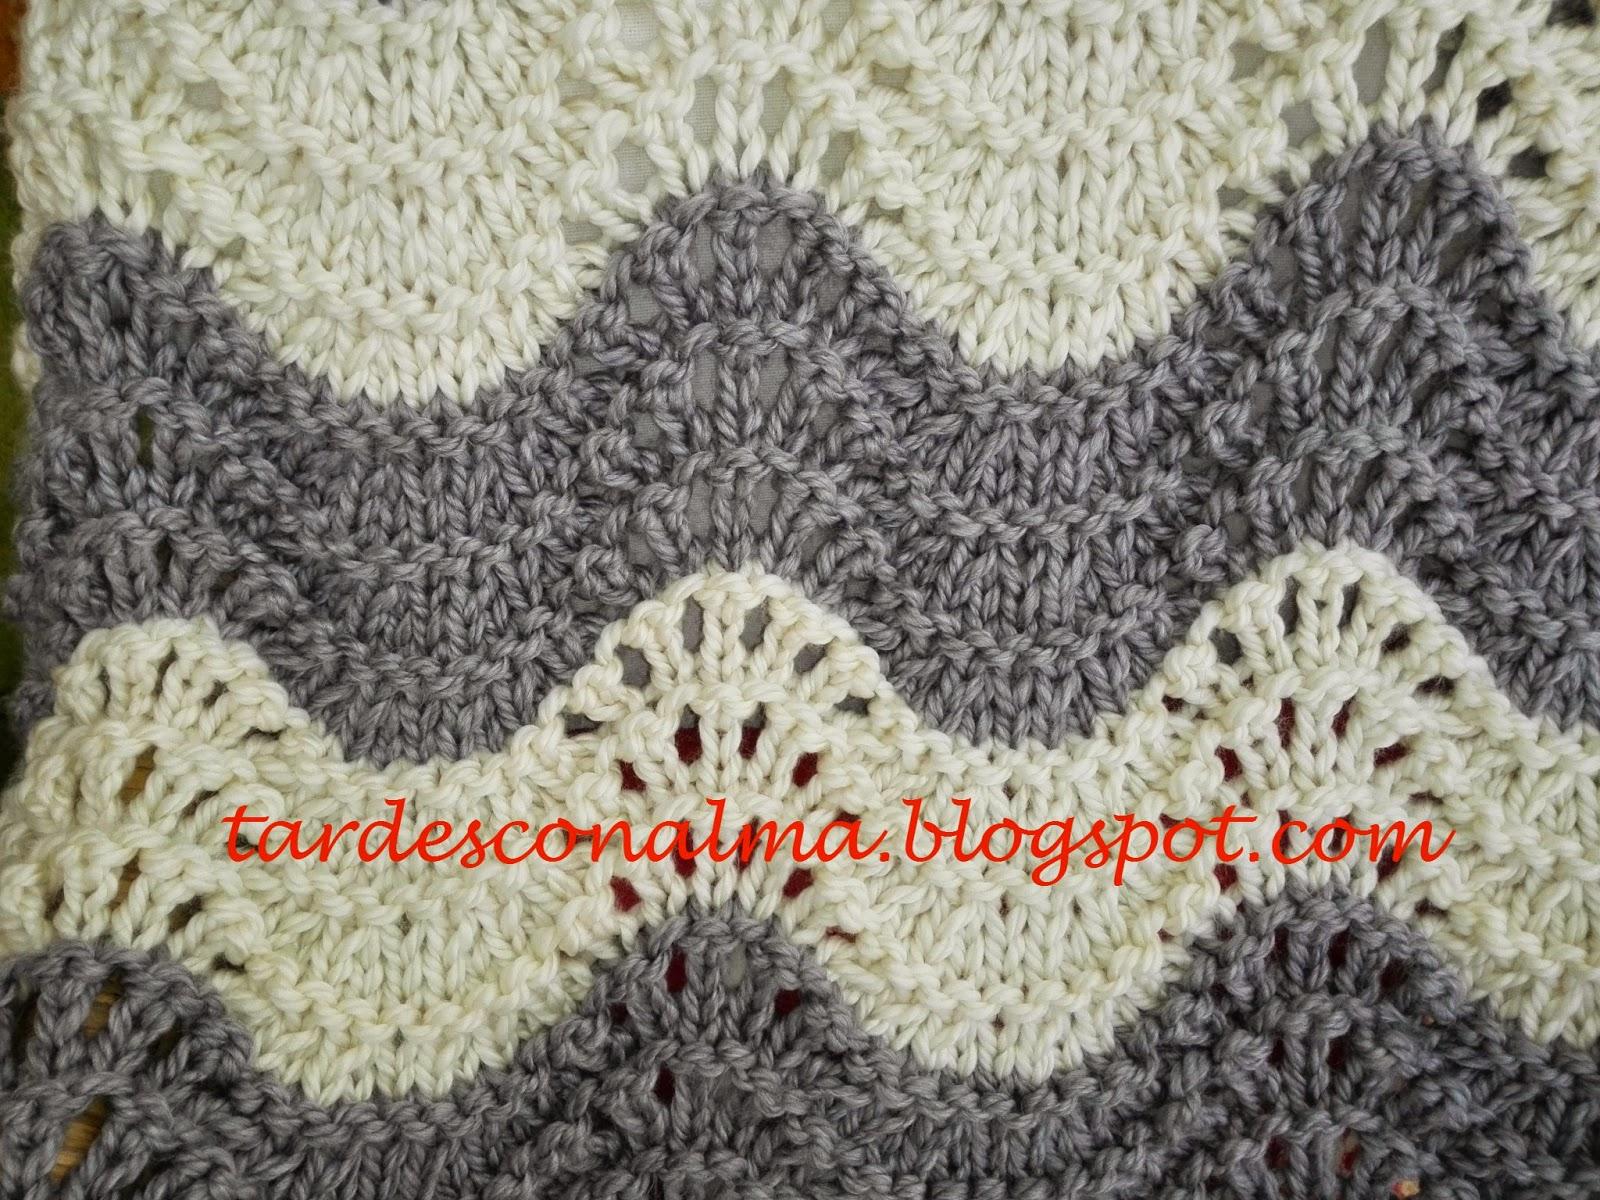 tardesconalma.blogspot.com